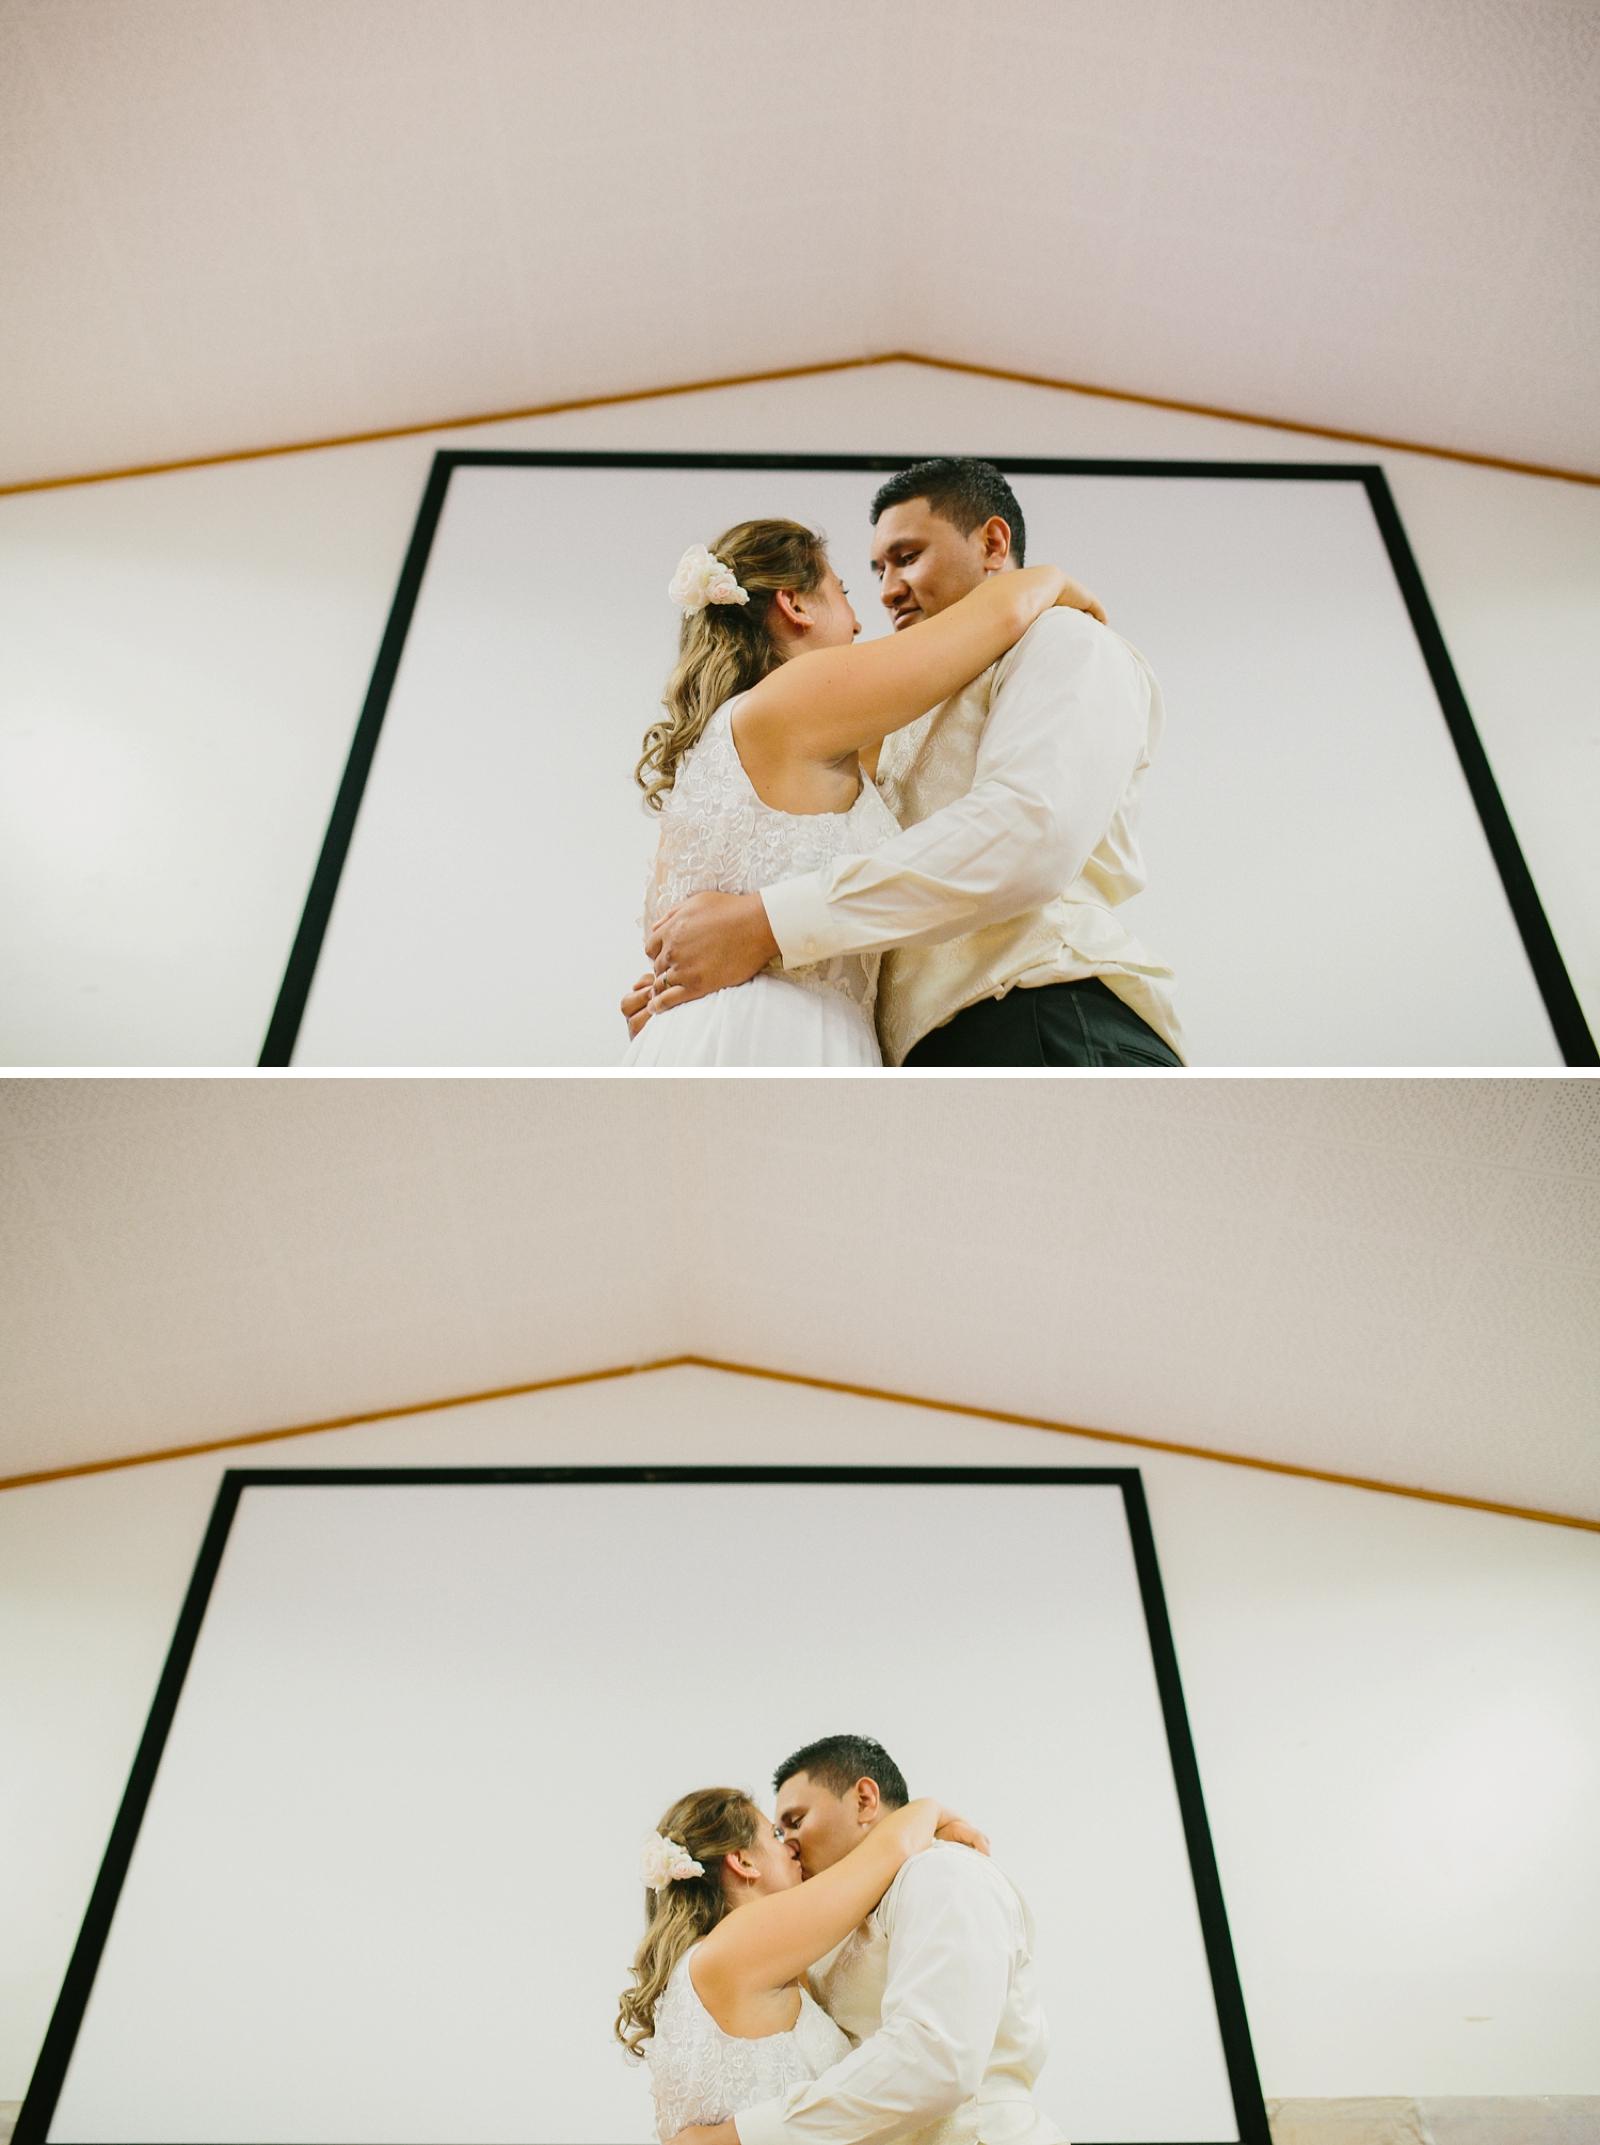 GabbyFiti_Auckland Wedding Photographer_Patty Lagera_0101.jpg